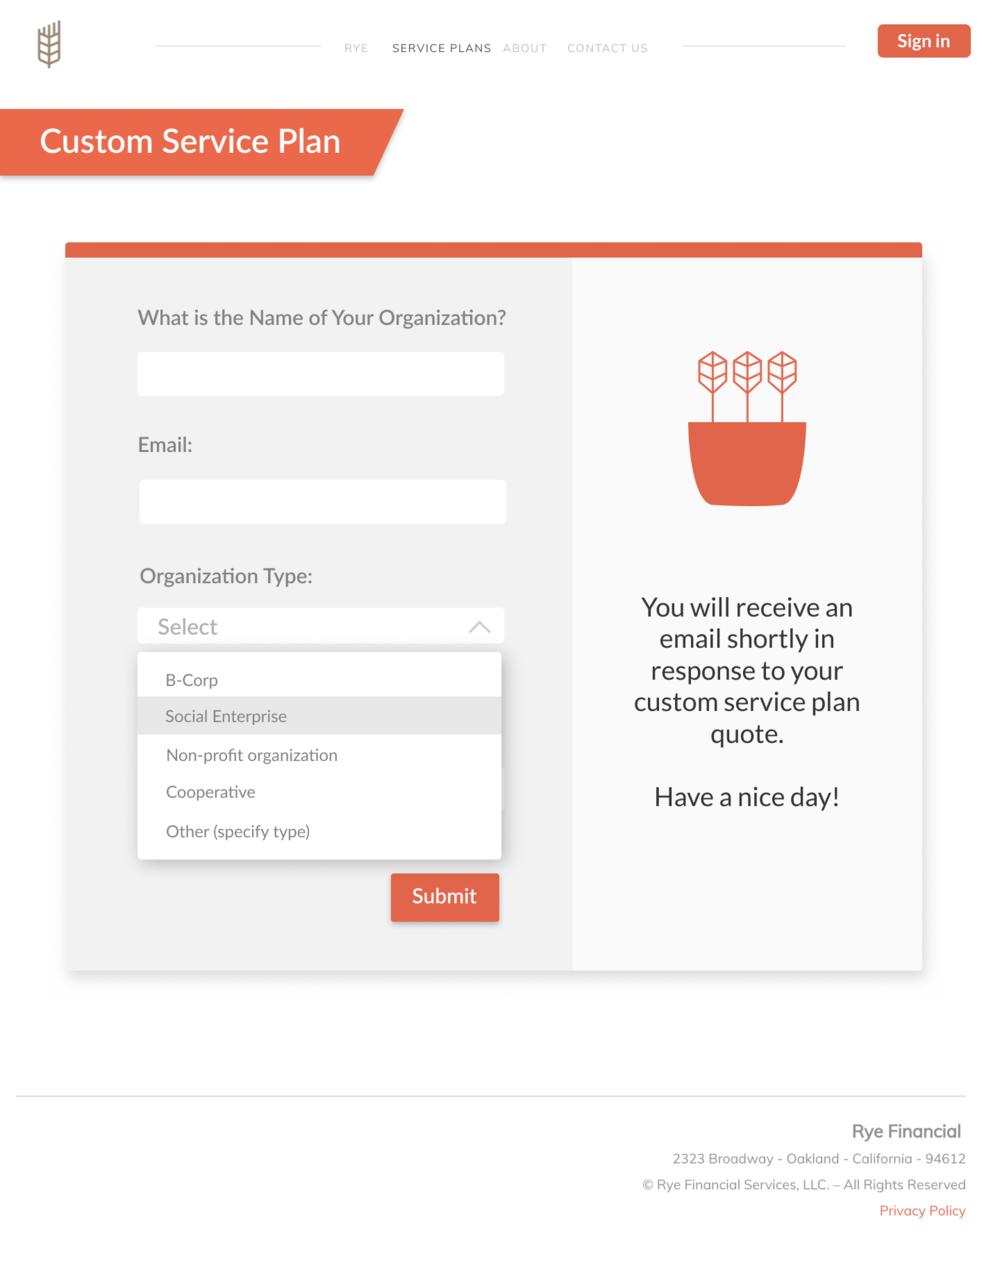 Custom service plan form